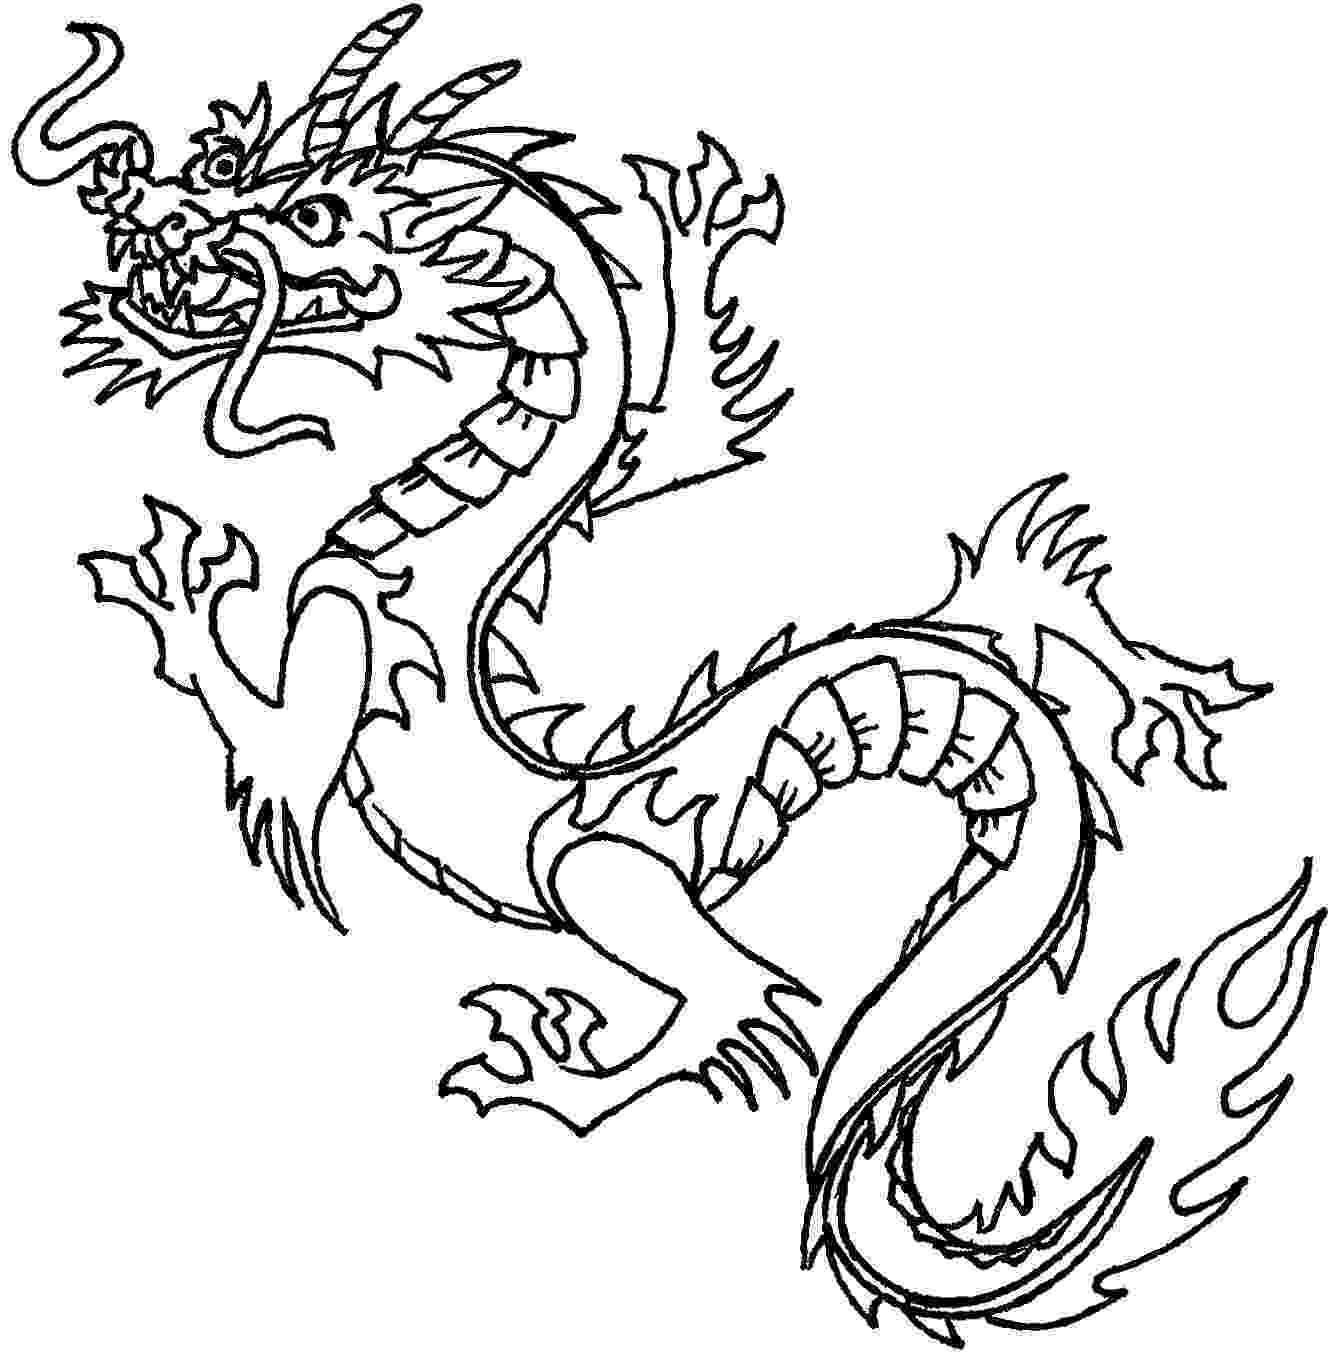 chinese dragon color sheets free printable chinese dragon coloring pages for kids chinese color dragon sheets